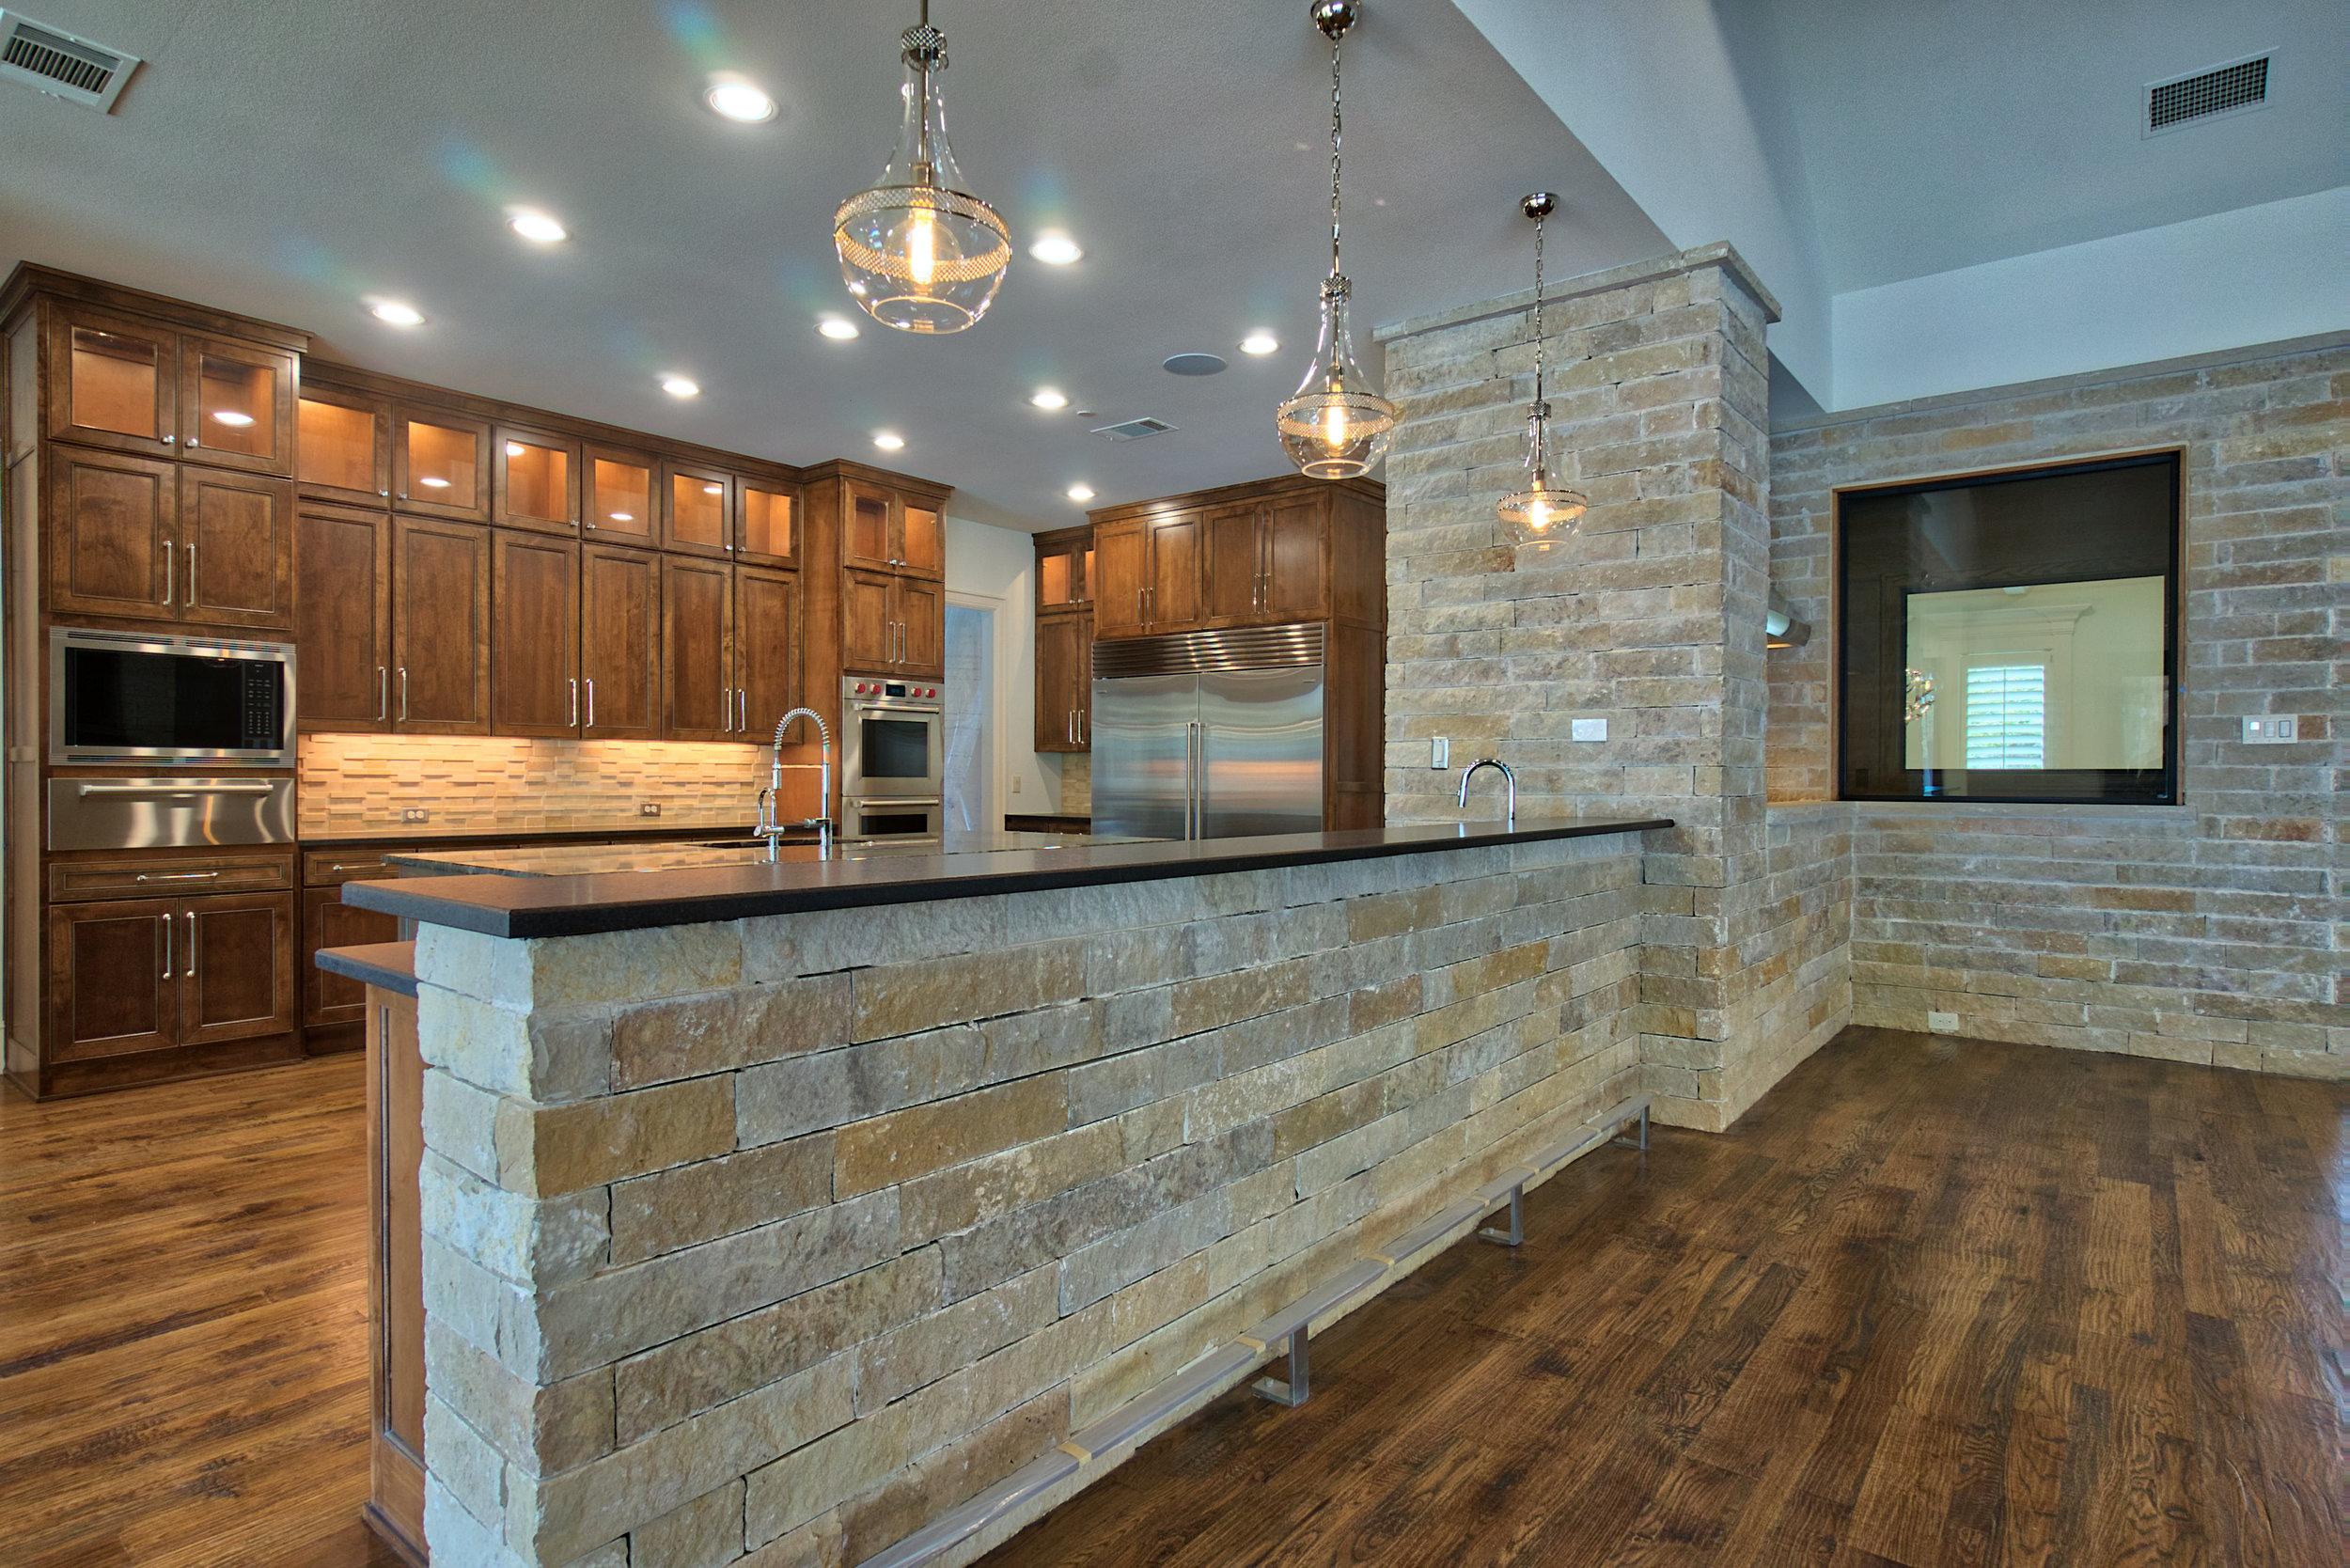 15 kitchen 8.jpeg